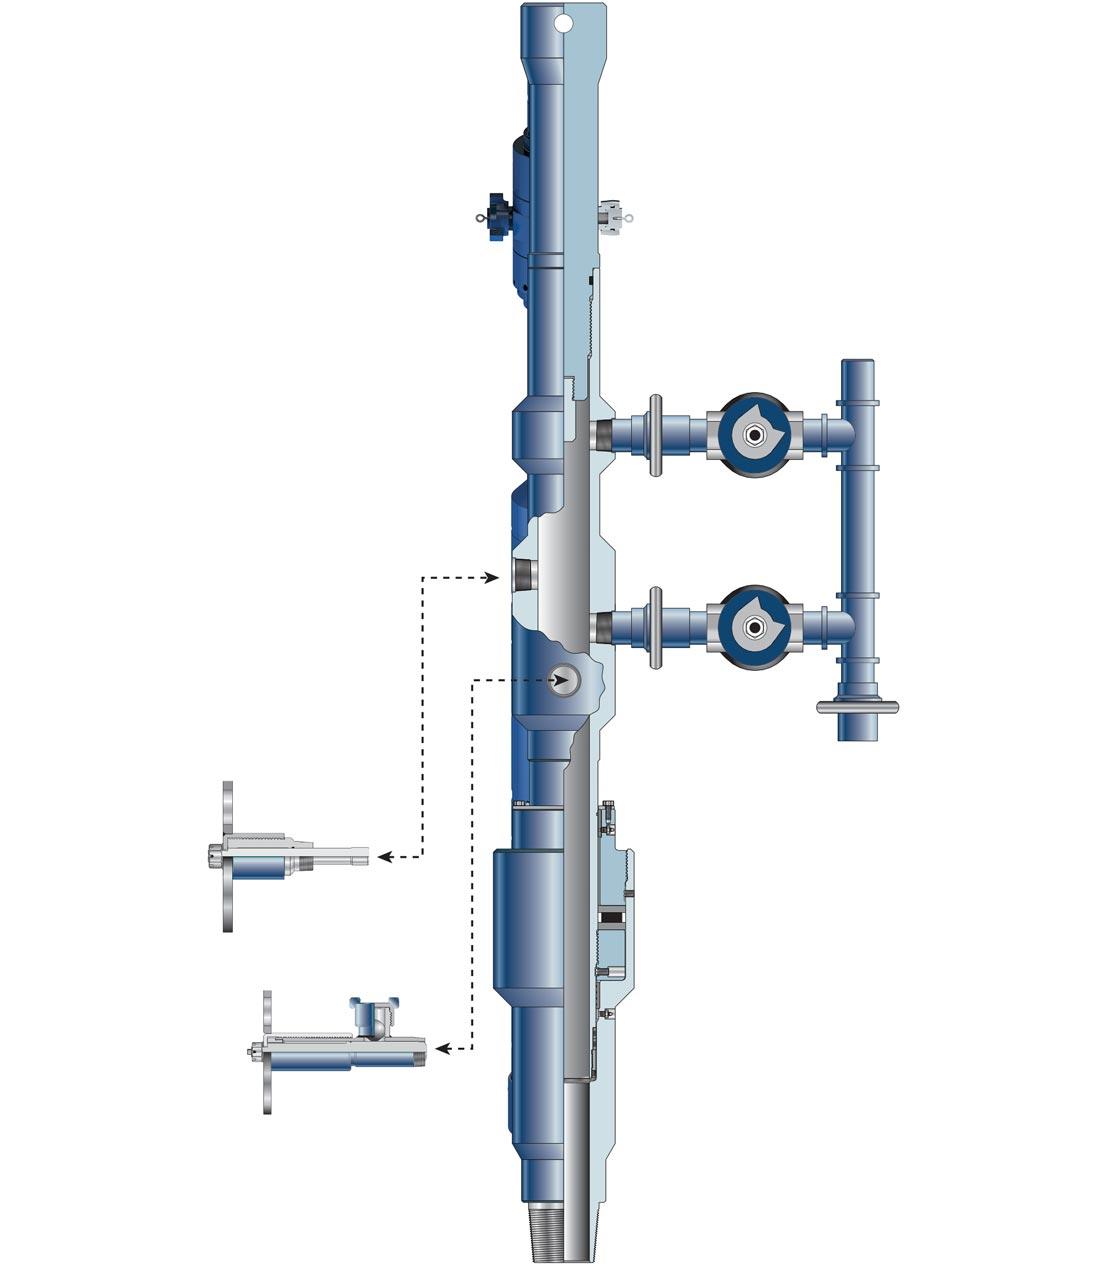 CMSB Solid-Body Cementing Manifold